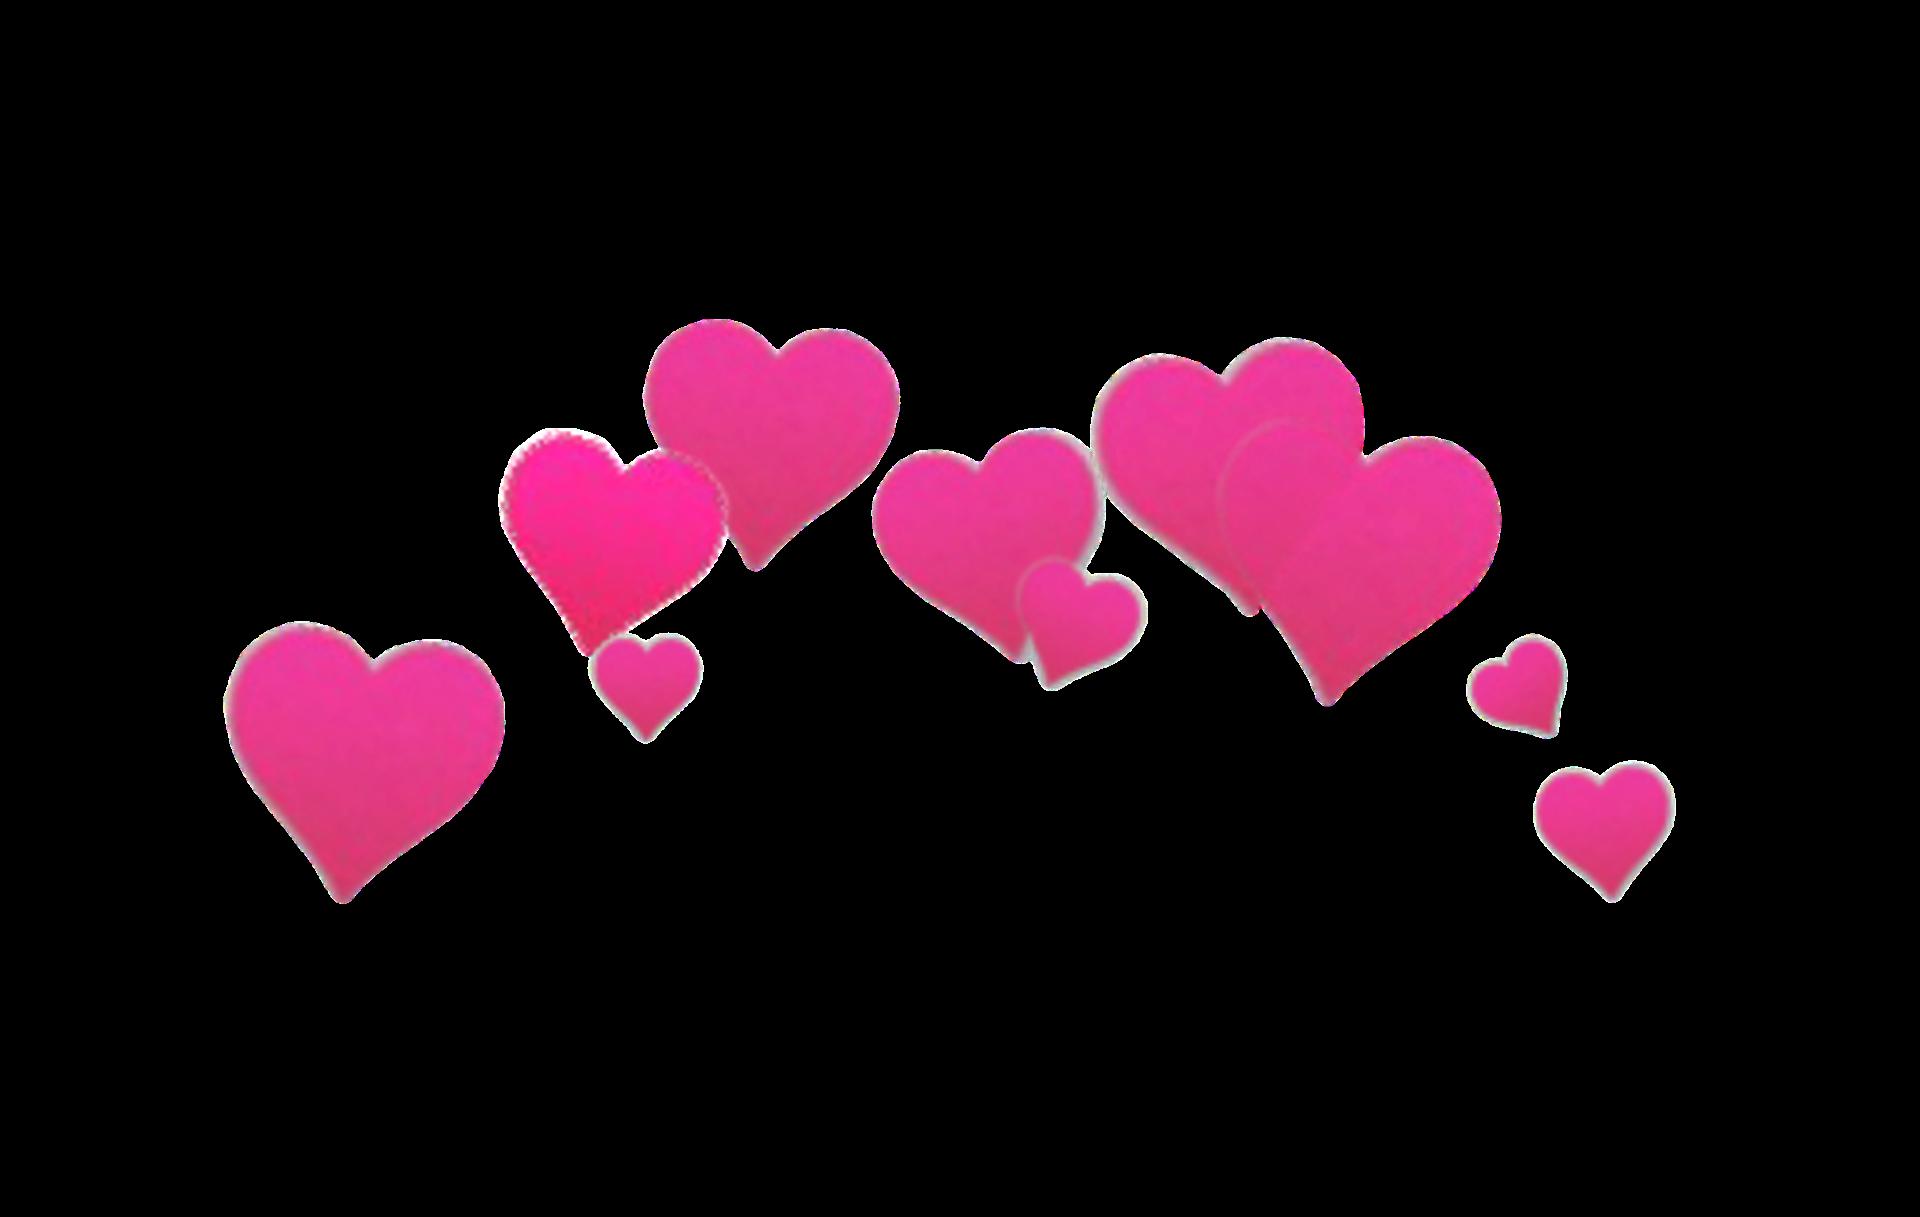 Pin By Juan Carlos On Alliyah Heart Overlay Overlays Transparent Overlays Tumblr